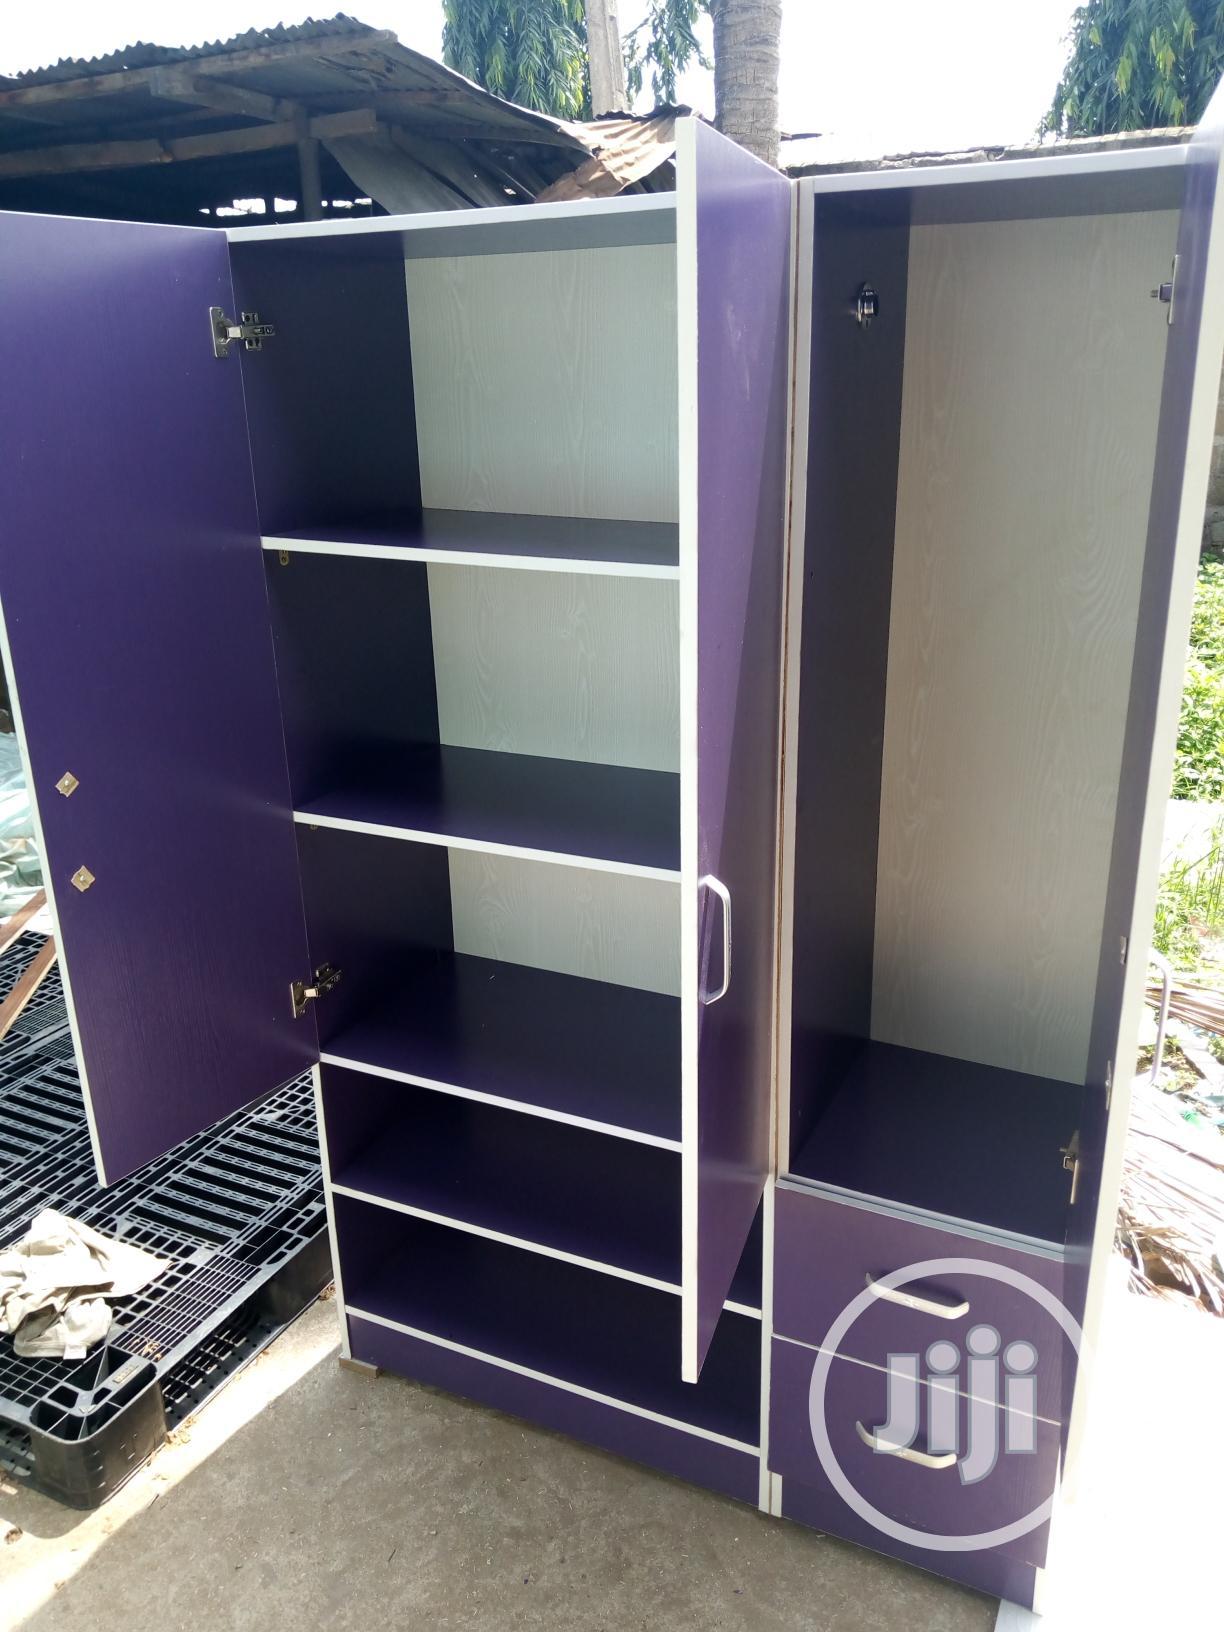 6ft X 4ft Wardrobe | Furniture for sale in Oshodi-Isolo, Lagos State, Nigeria